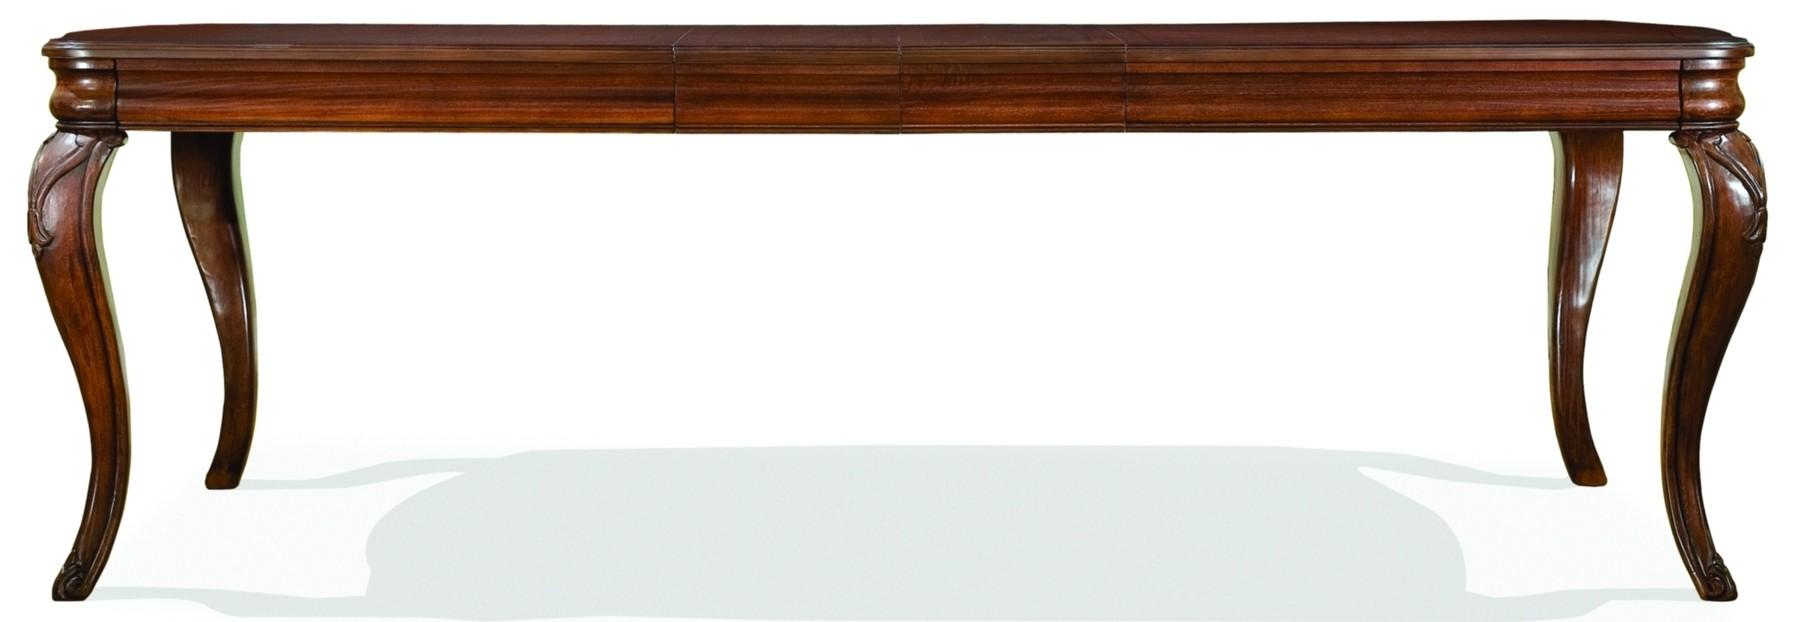 Evolution Rectangular Leg Dining Room Set from Legacy  : 9180 2222 from colemanfurniture.com size 1800 x 622 jpeg 110kB